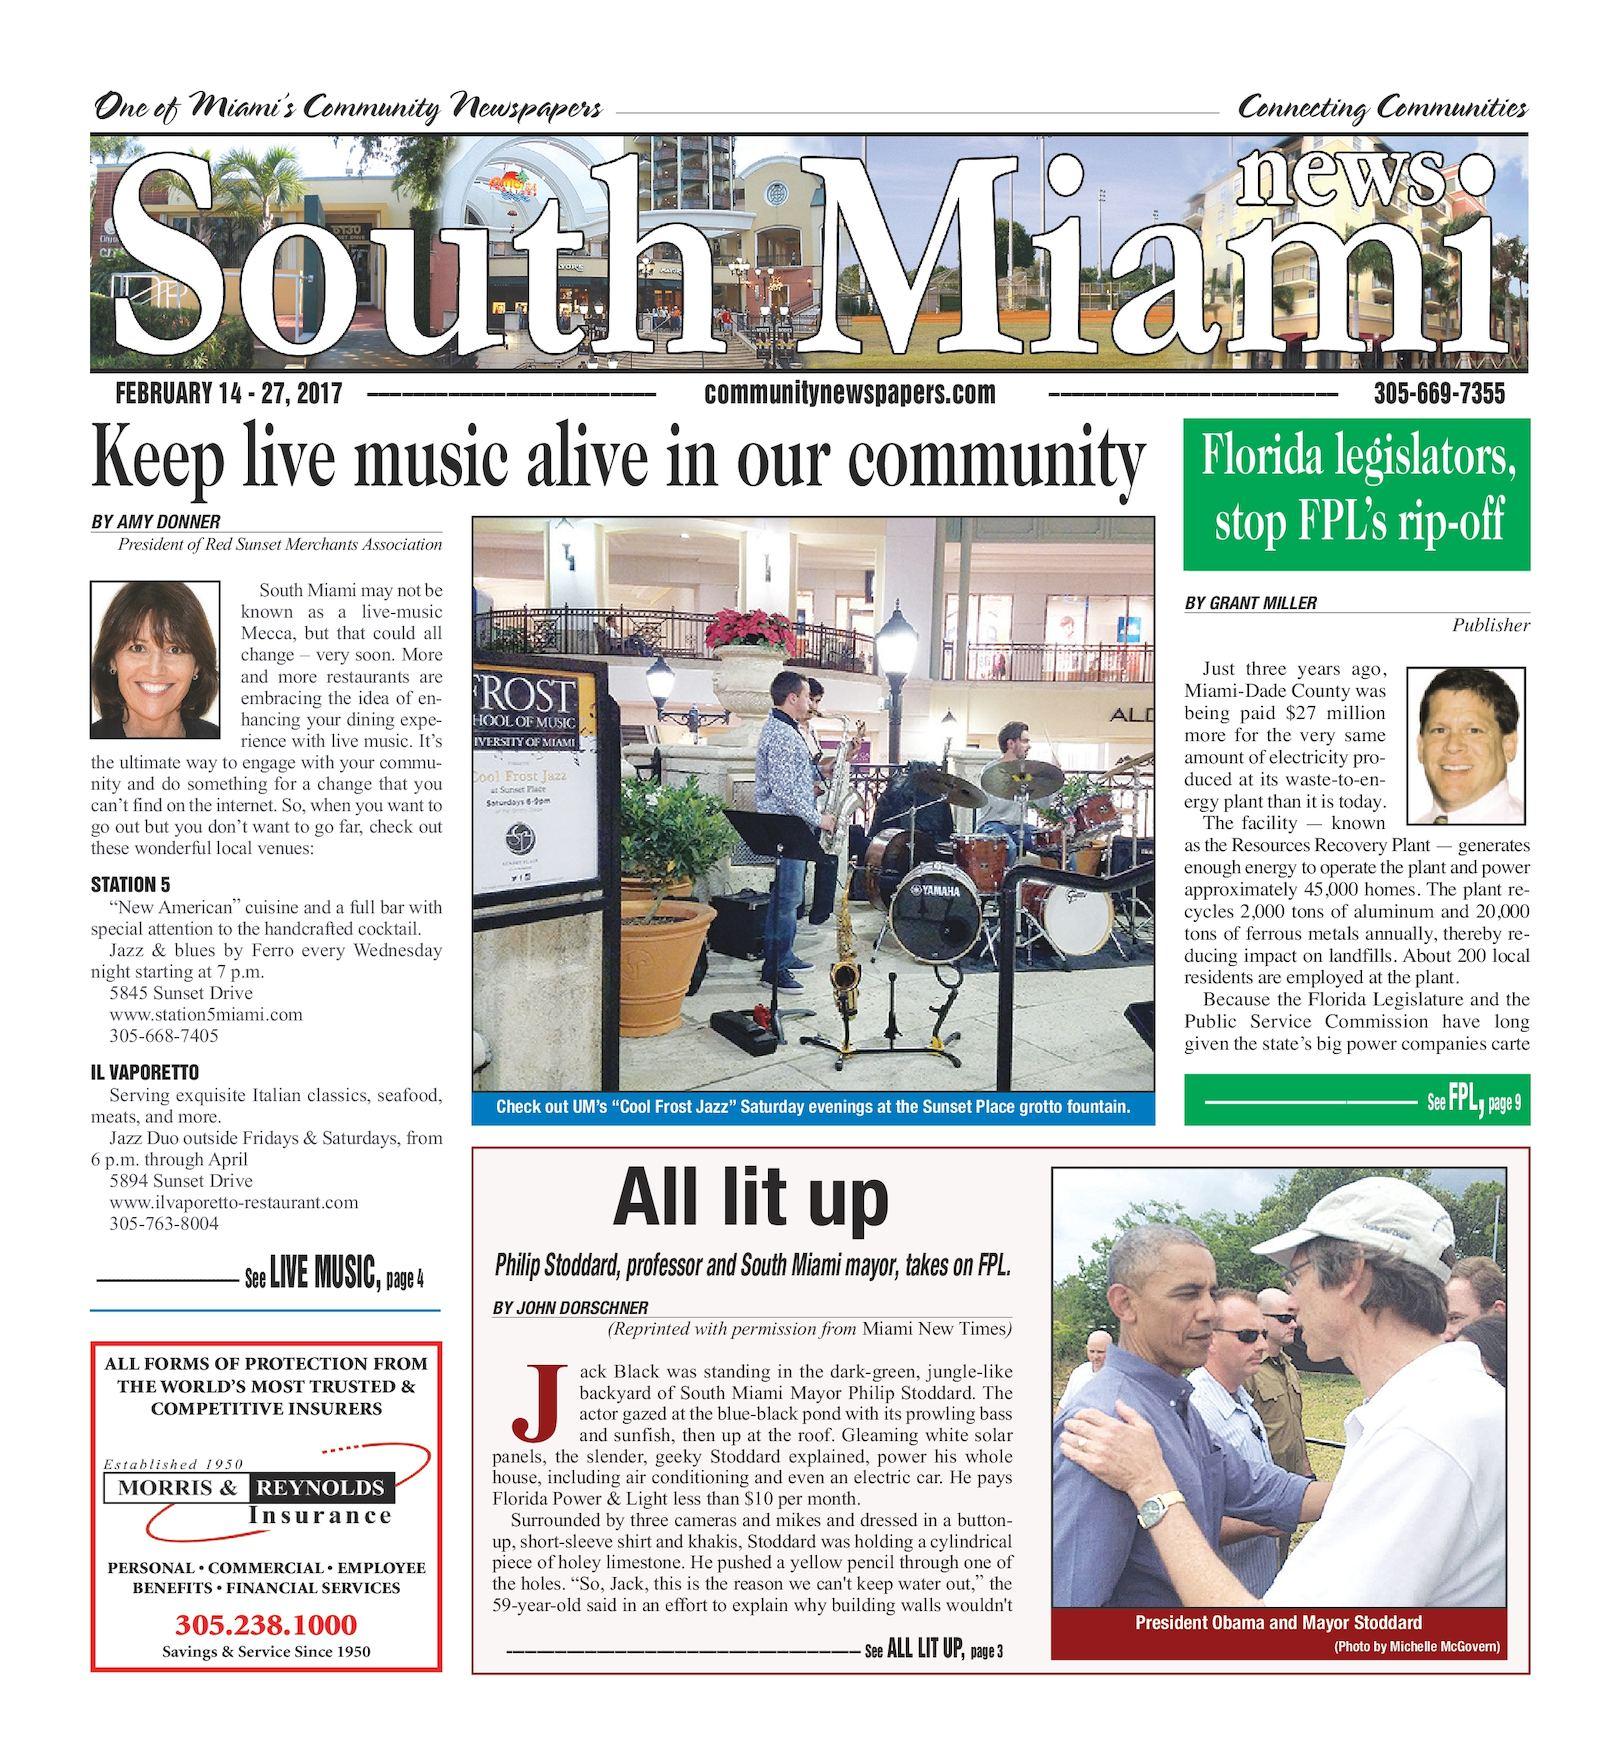 Calaméo - South Miami News 02 14 2017